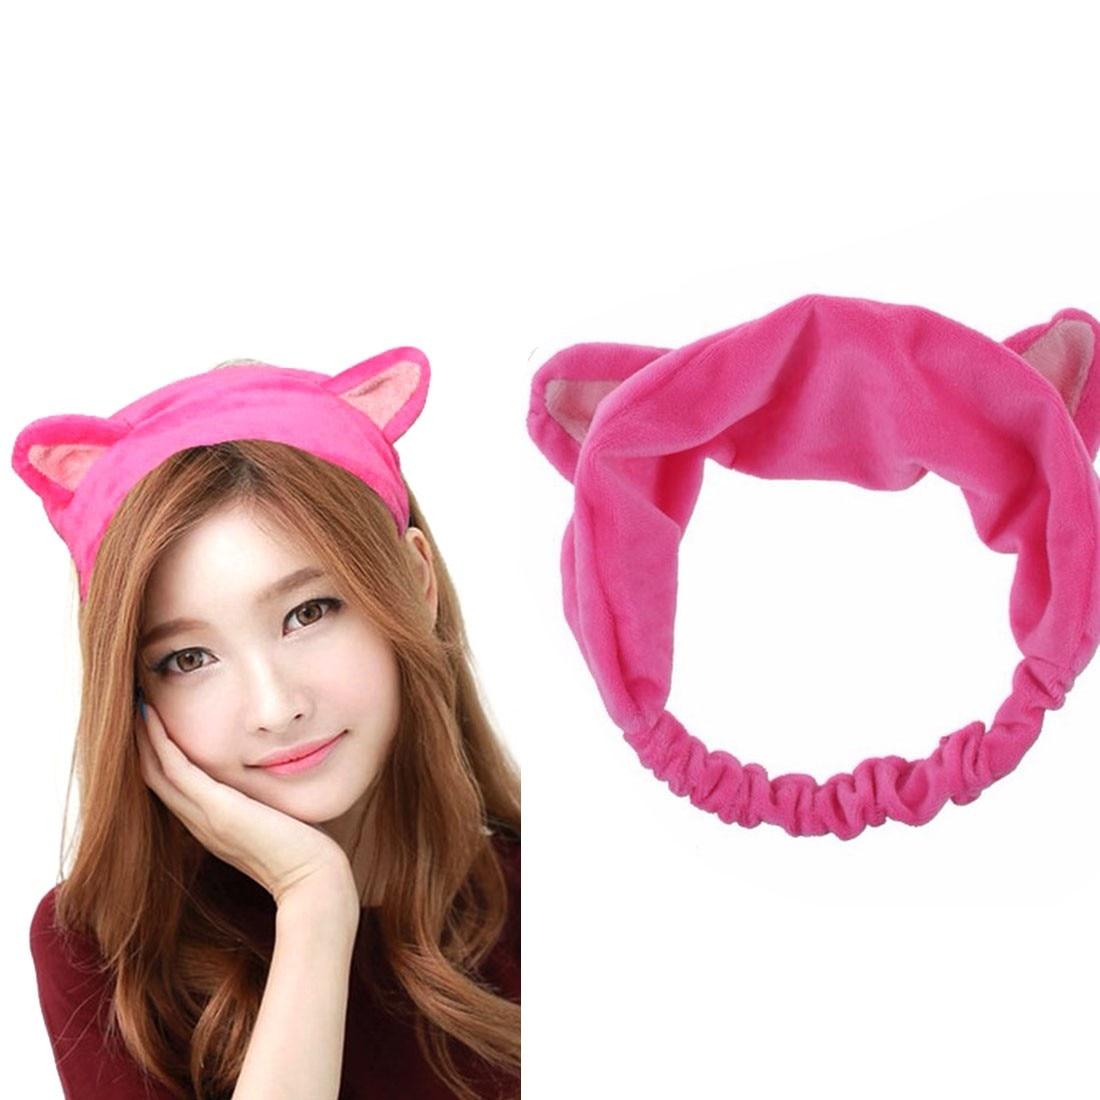 Hot 1PC Cat Ear Headband Women Hair Accessories Wash Shower Cap Head Ornaments Elastic Hairband Party Halloween Headdress